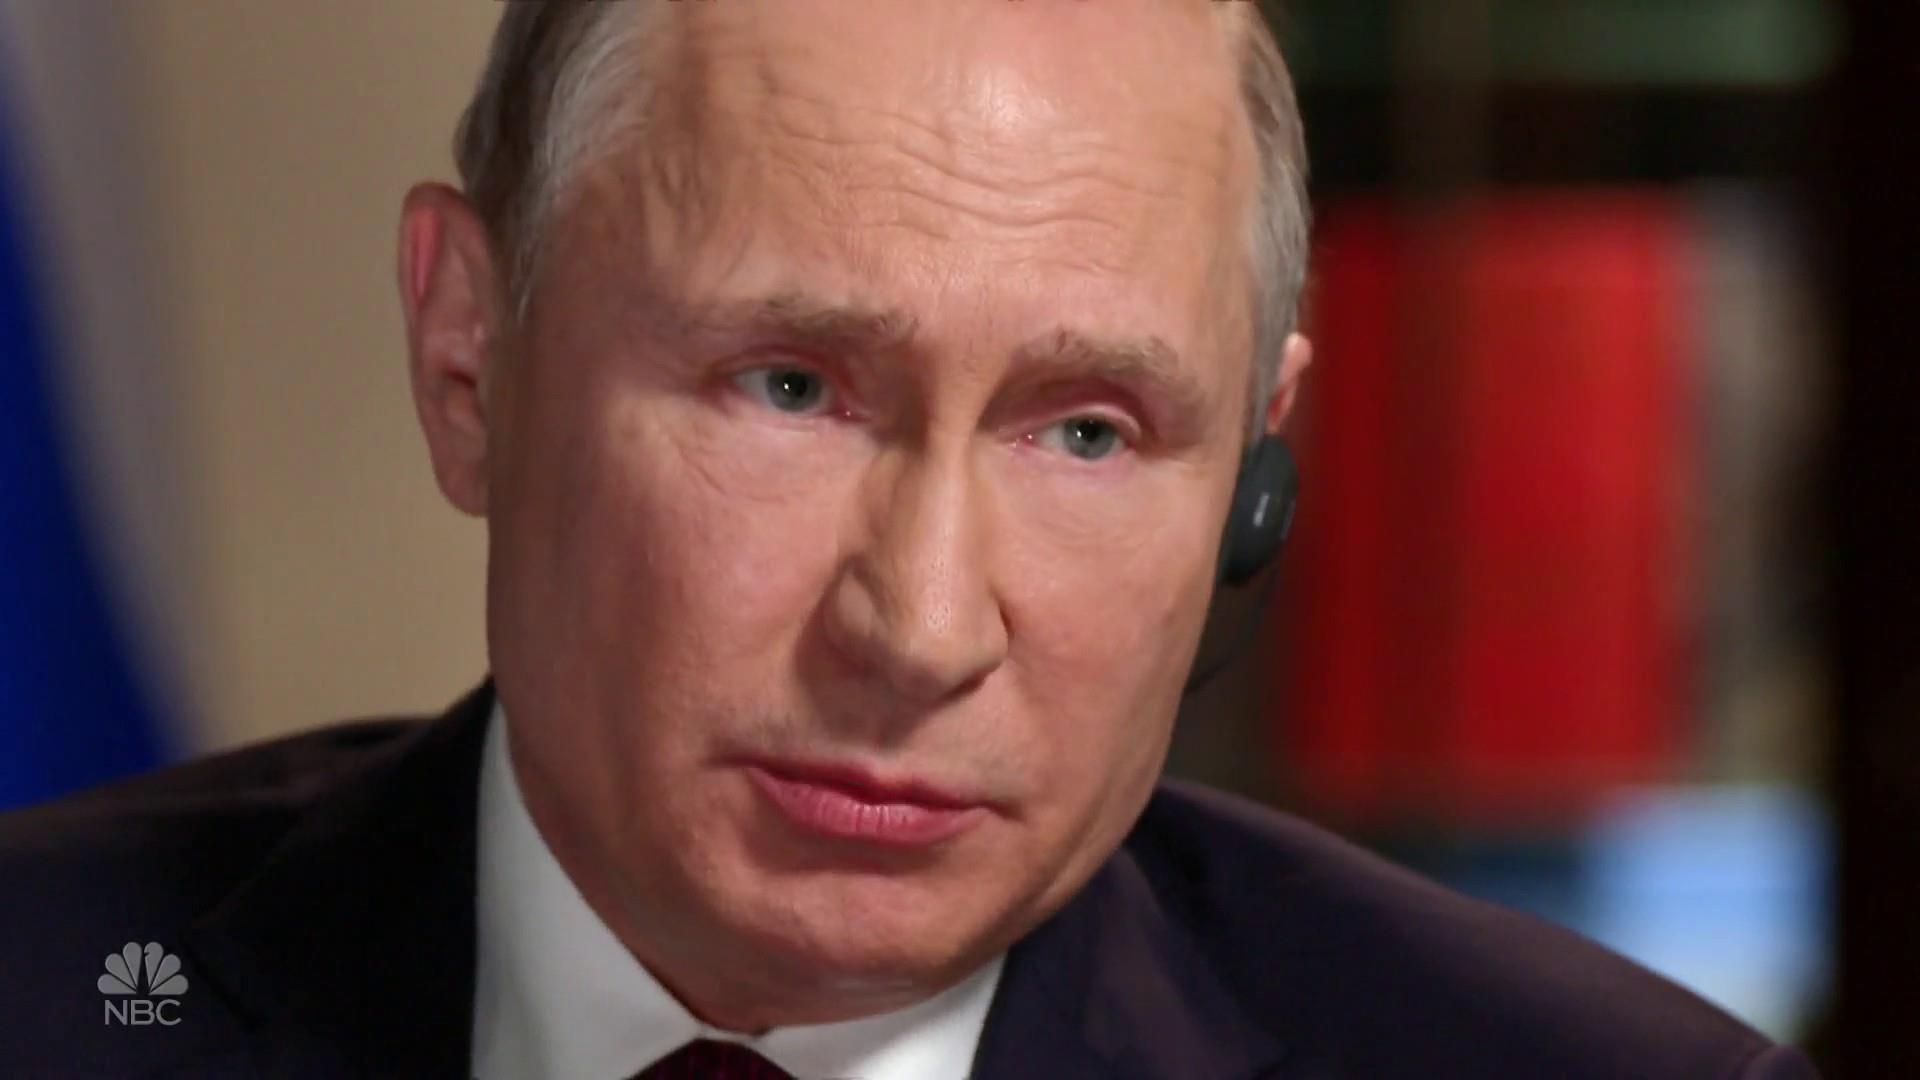 Watch Megyn Kelly's extended interview with Russian President Vladimir Putin in Kaliningrad